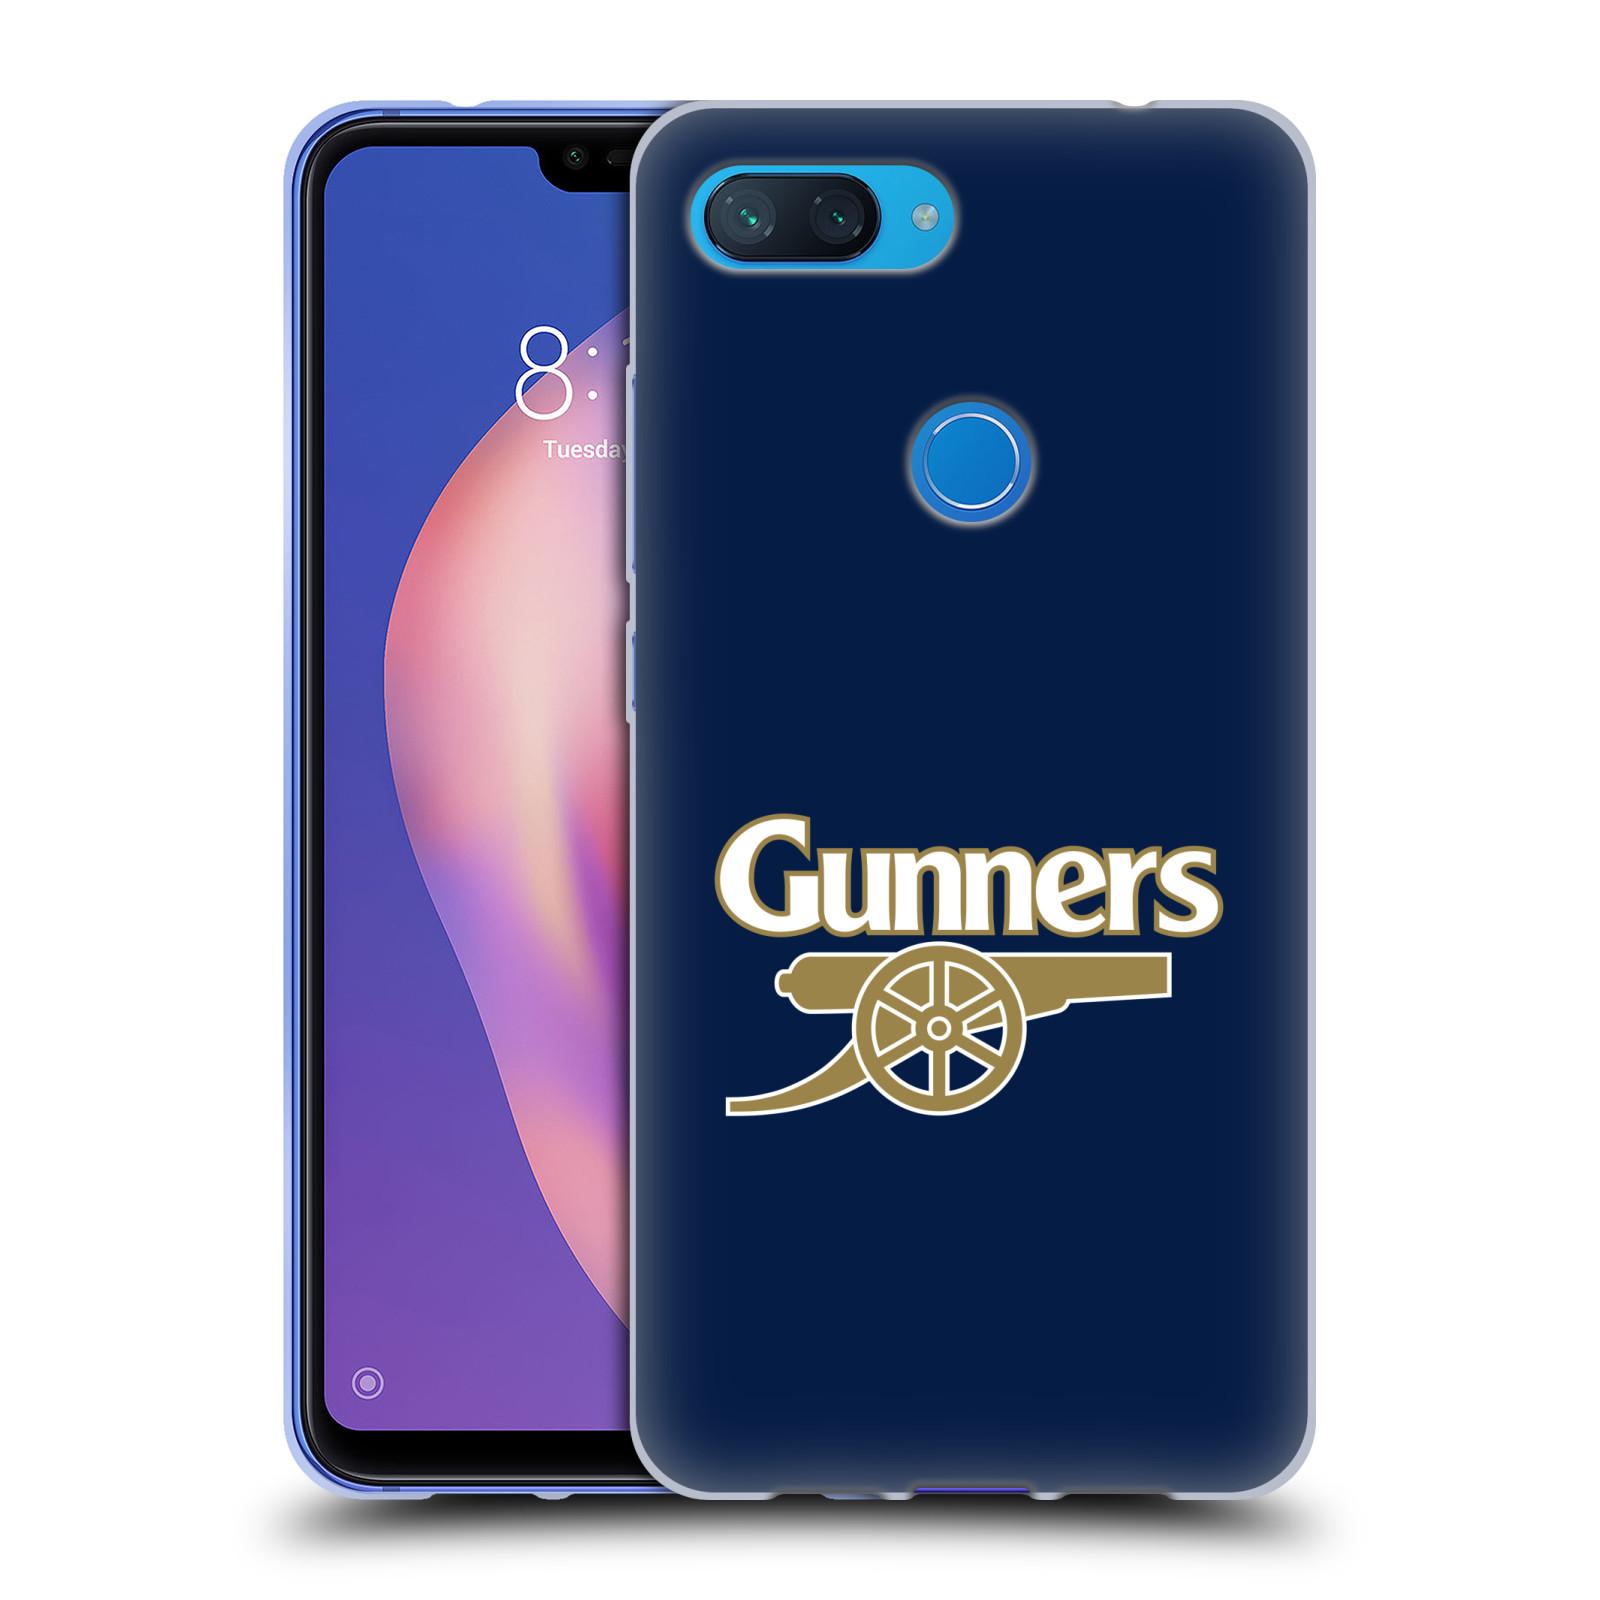 Silikonové pouzdro na mobil Xiaomi Mi 8 Lite - Head Case - Arsenal FC - Gunners